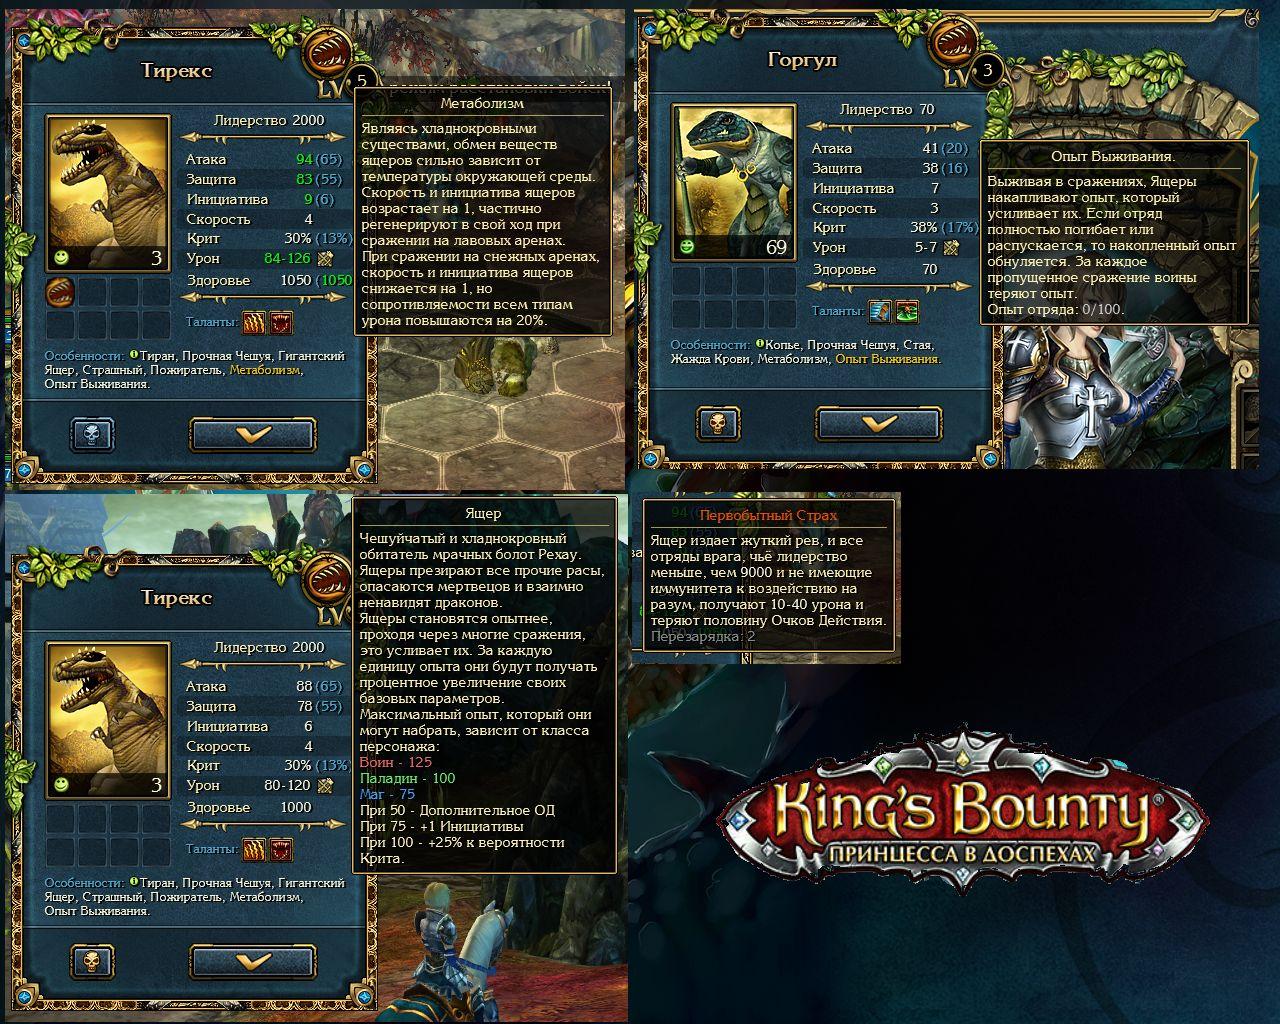 Сила Перворождённых в Kings Bounty: Принцесса в доспехах